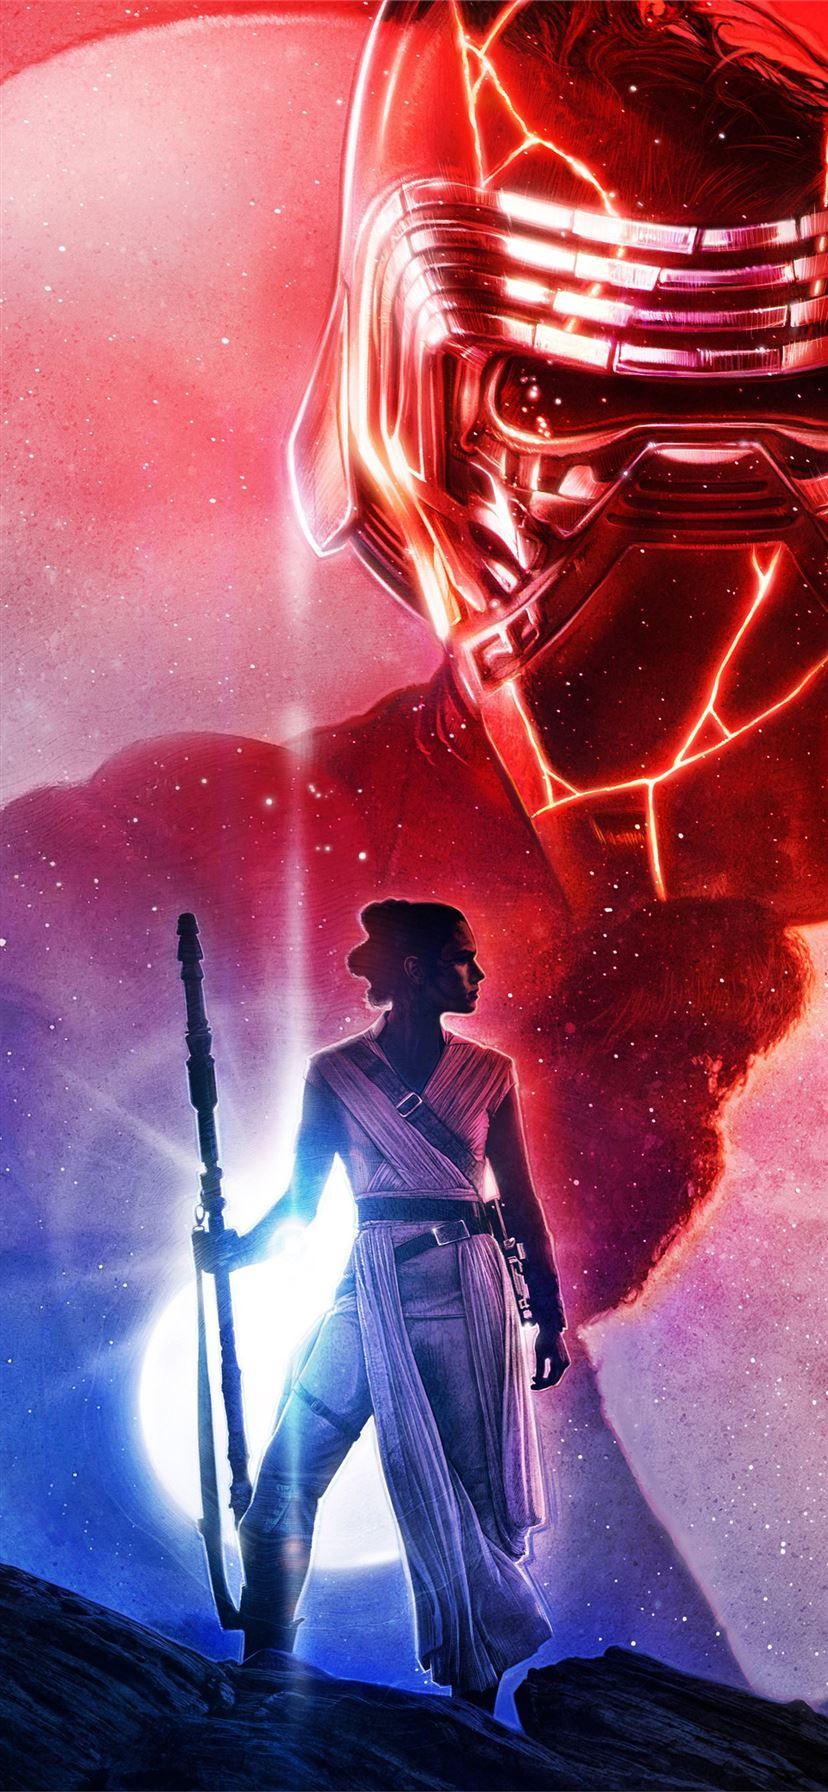 Best Star Wars The Last Jedi Iphone 11 Hd Wallpapers Ilikewallpaper